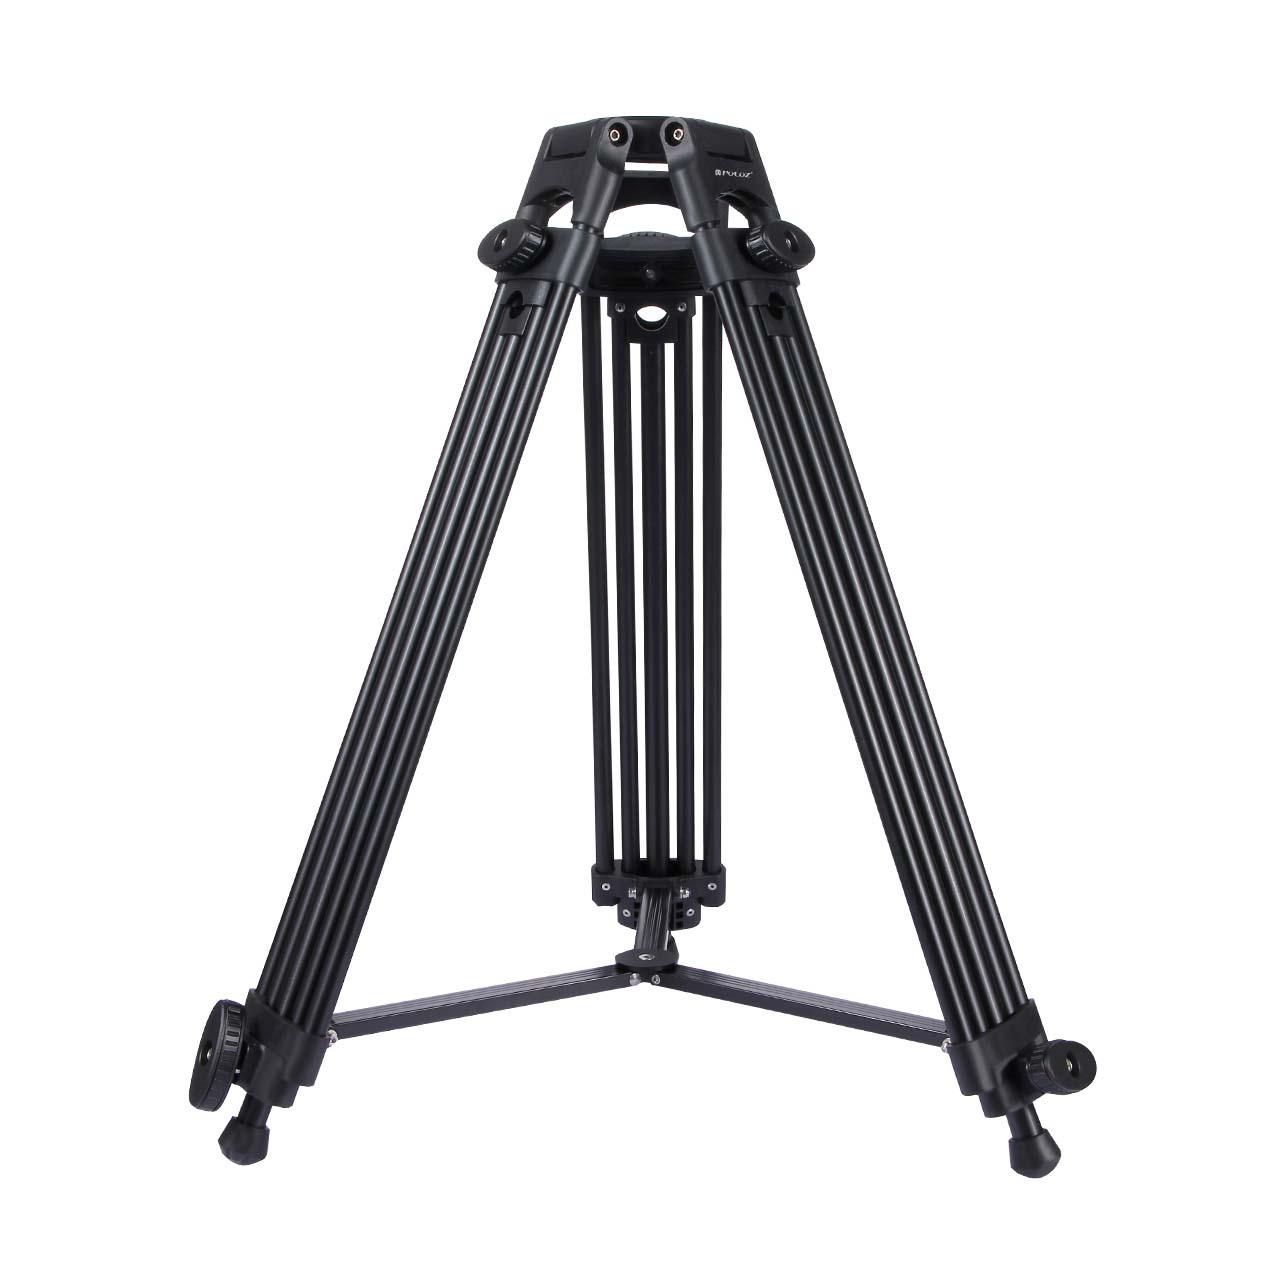 سه پایه دوربین پلوز مدل PU3003